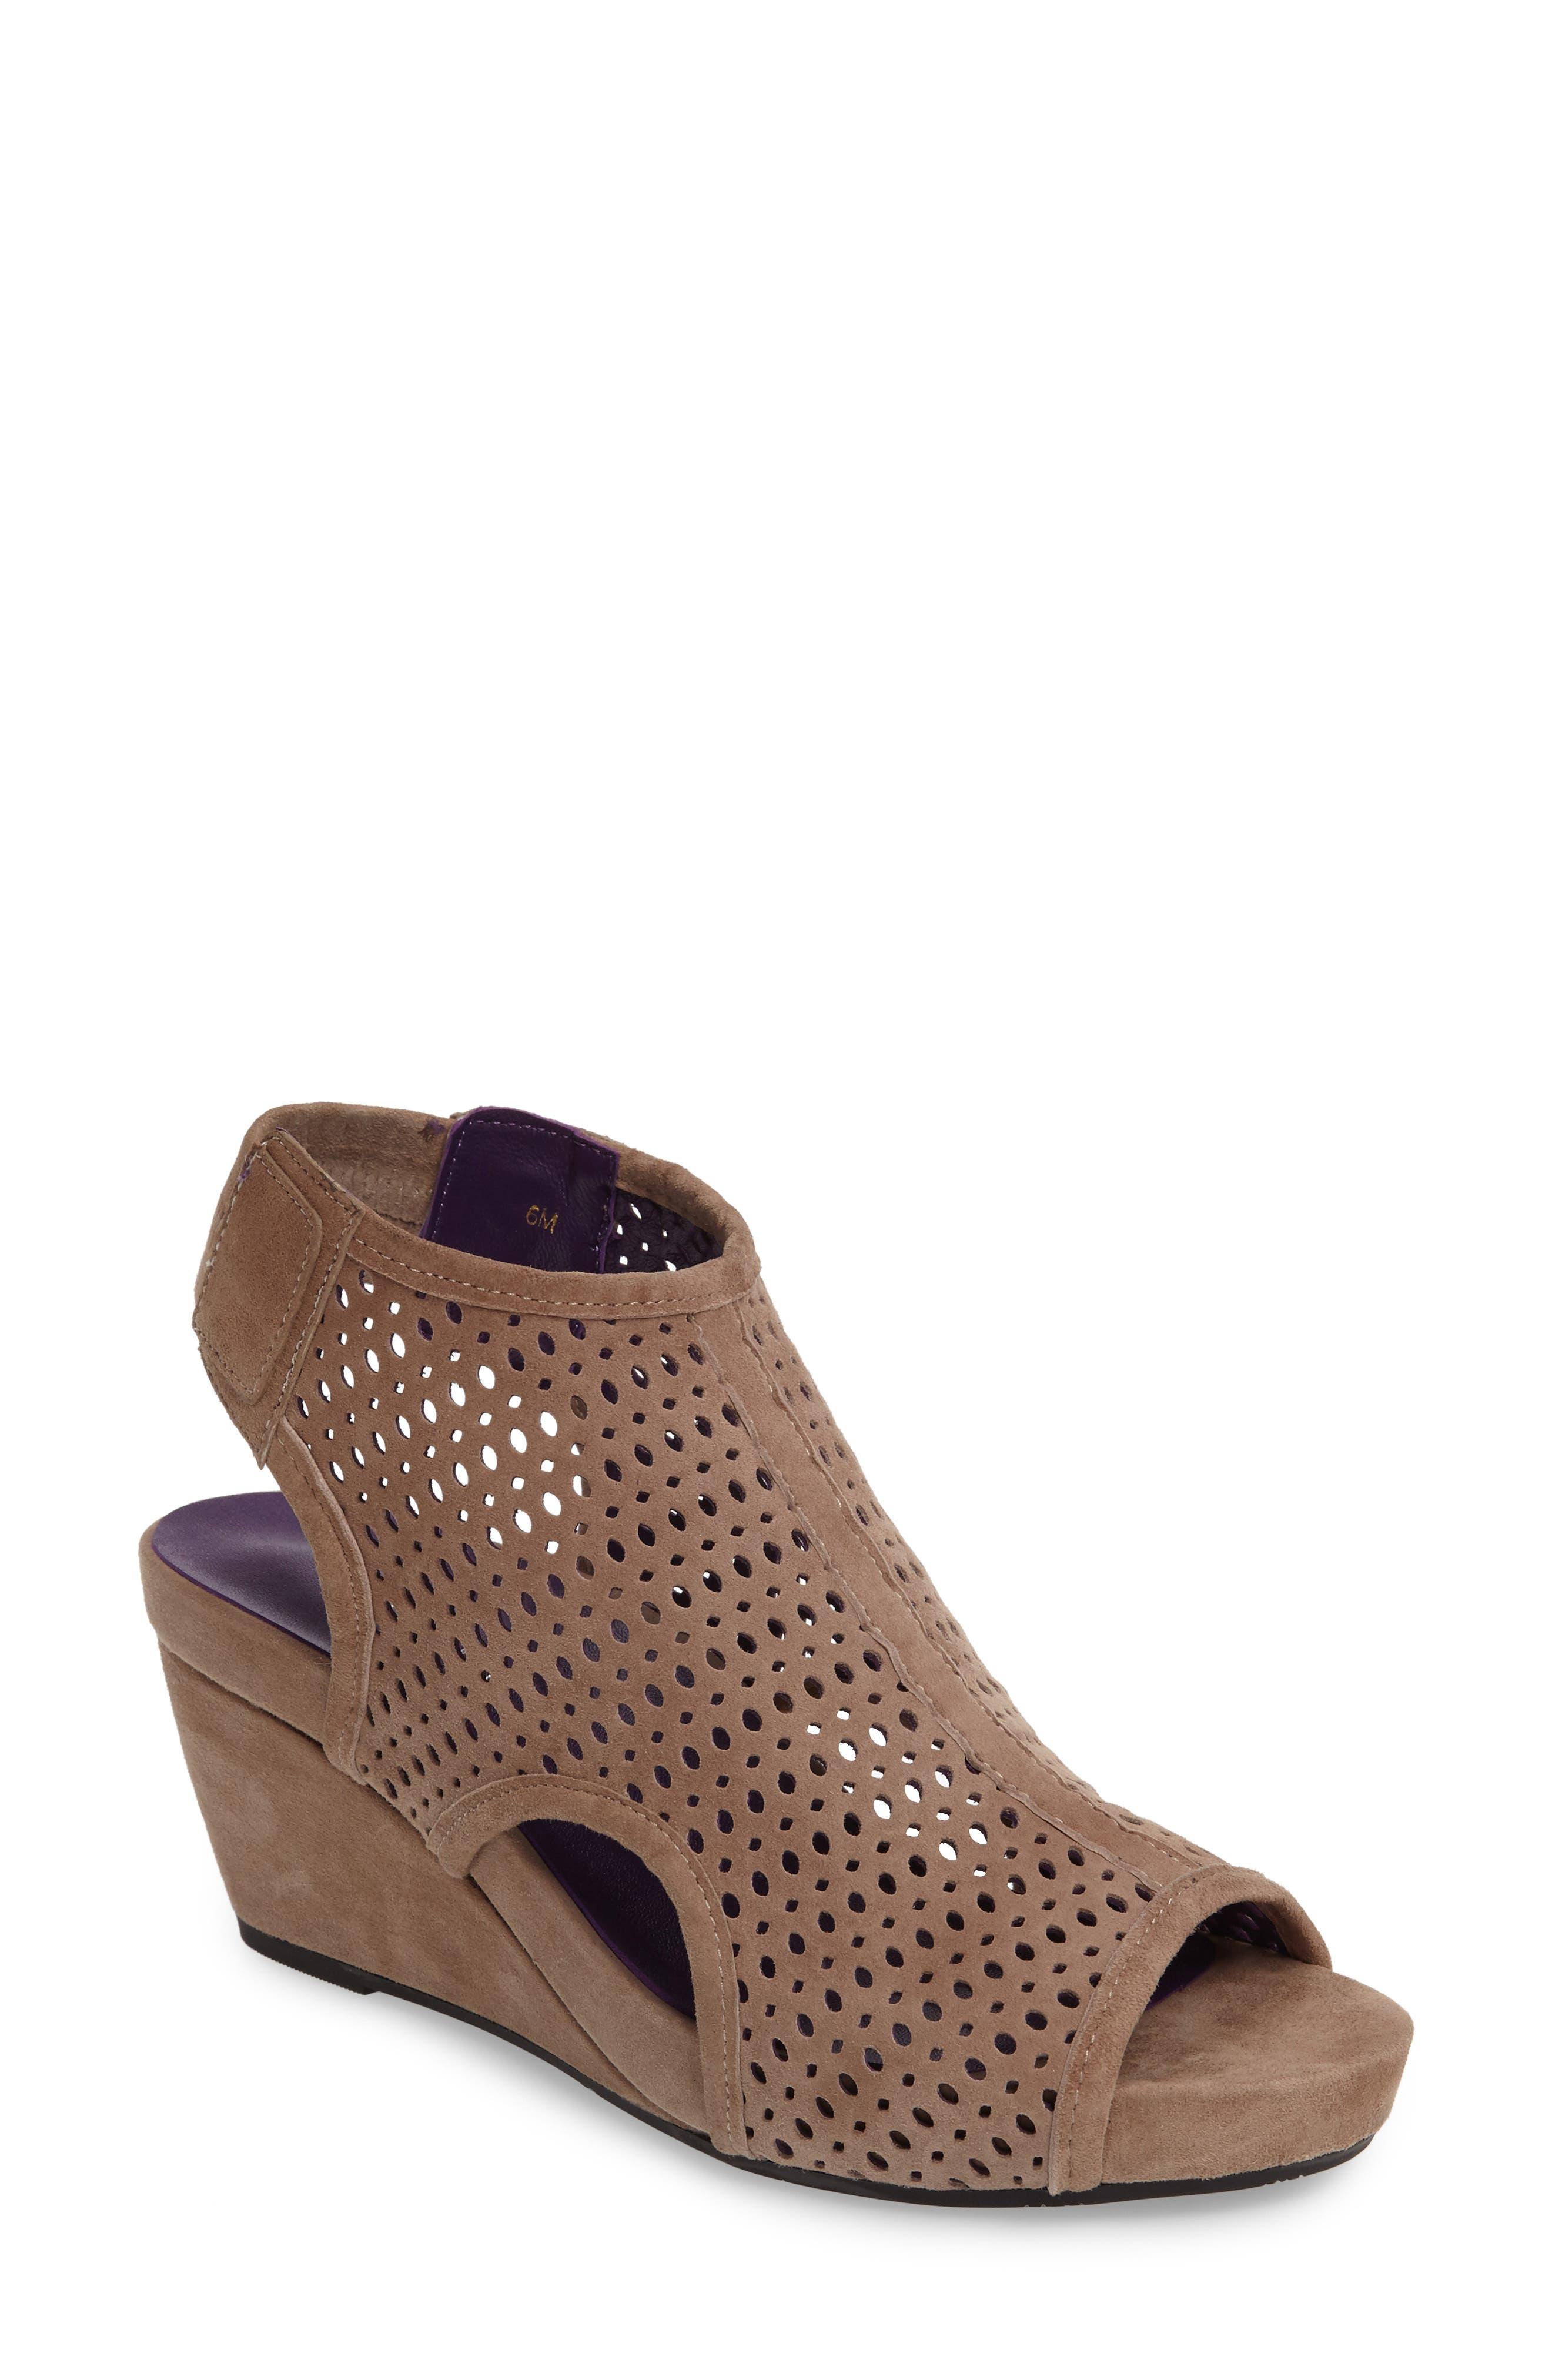 'Inez' Wedge Sandal,                             Main thumbnail 4, color,